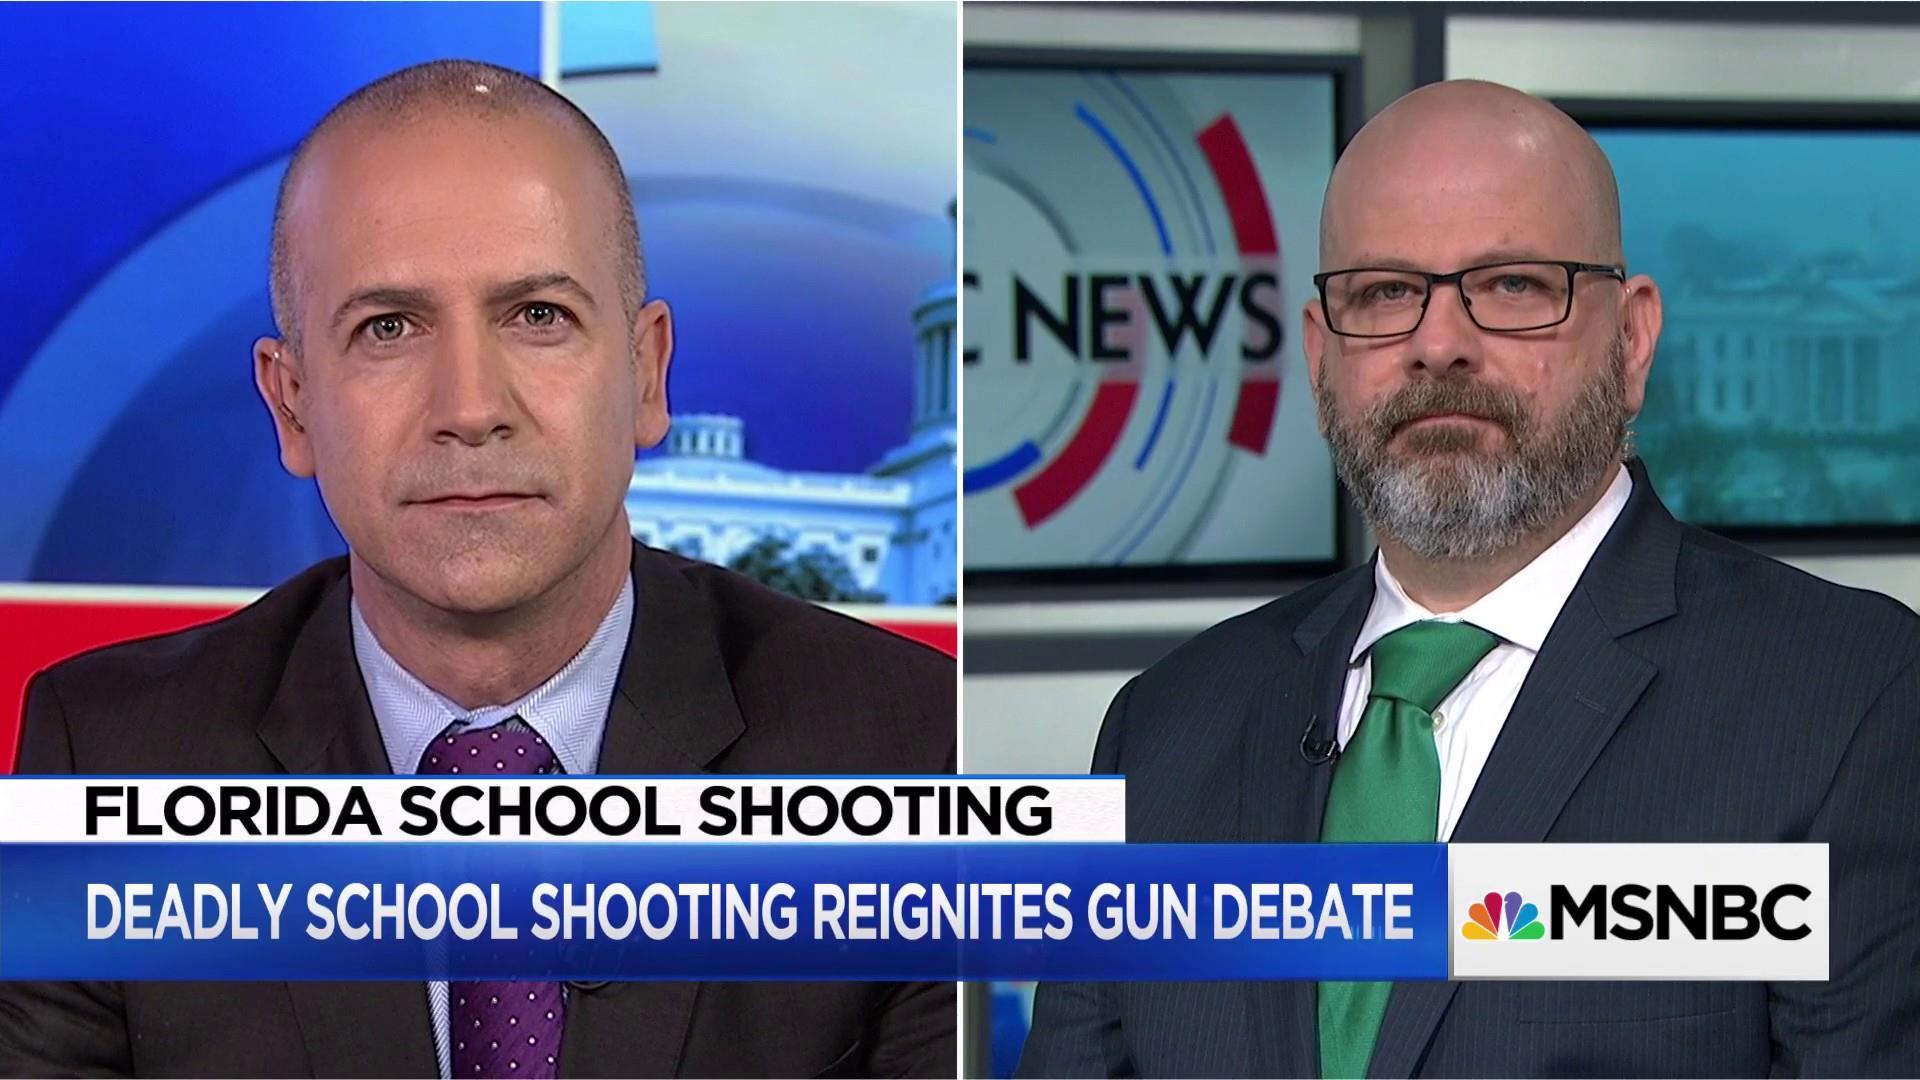 Gun Control Vs. Mental Health